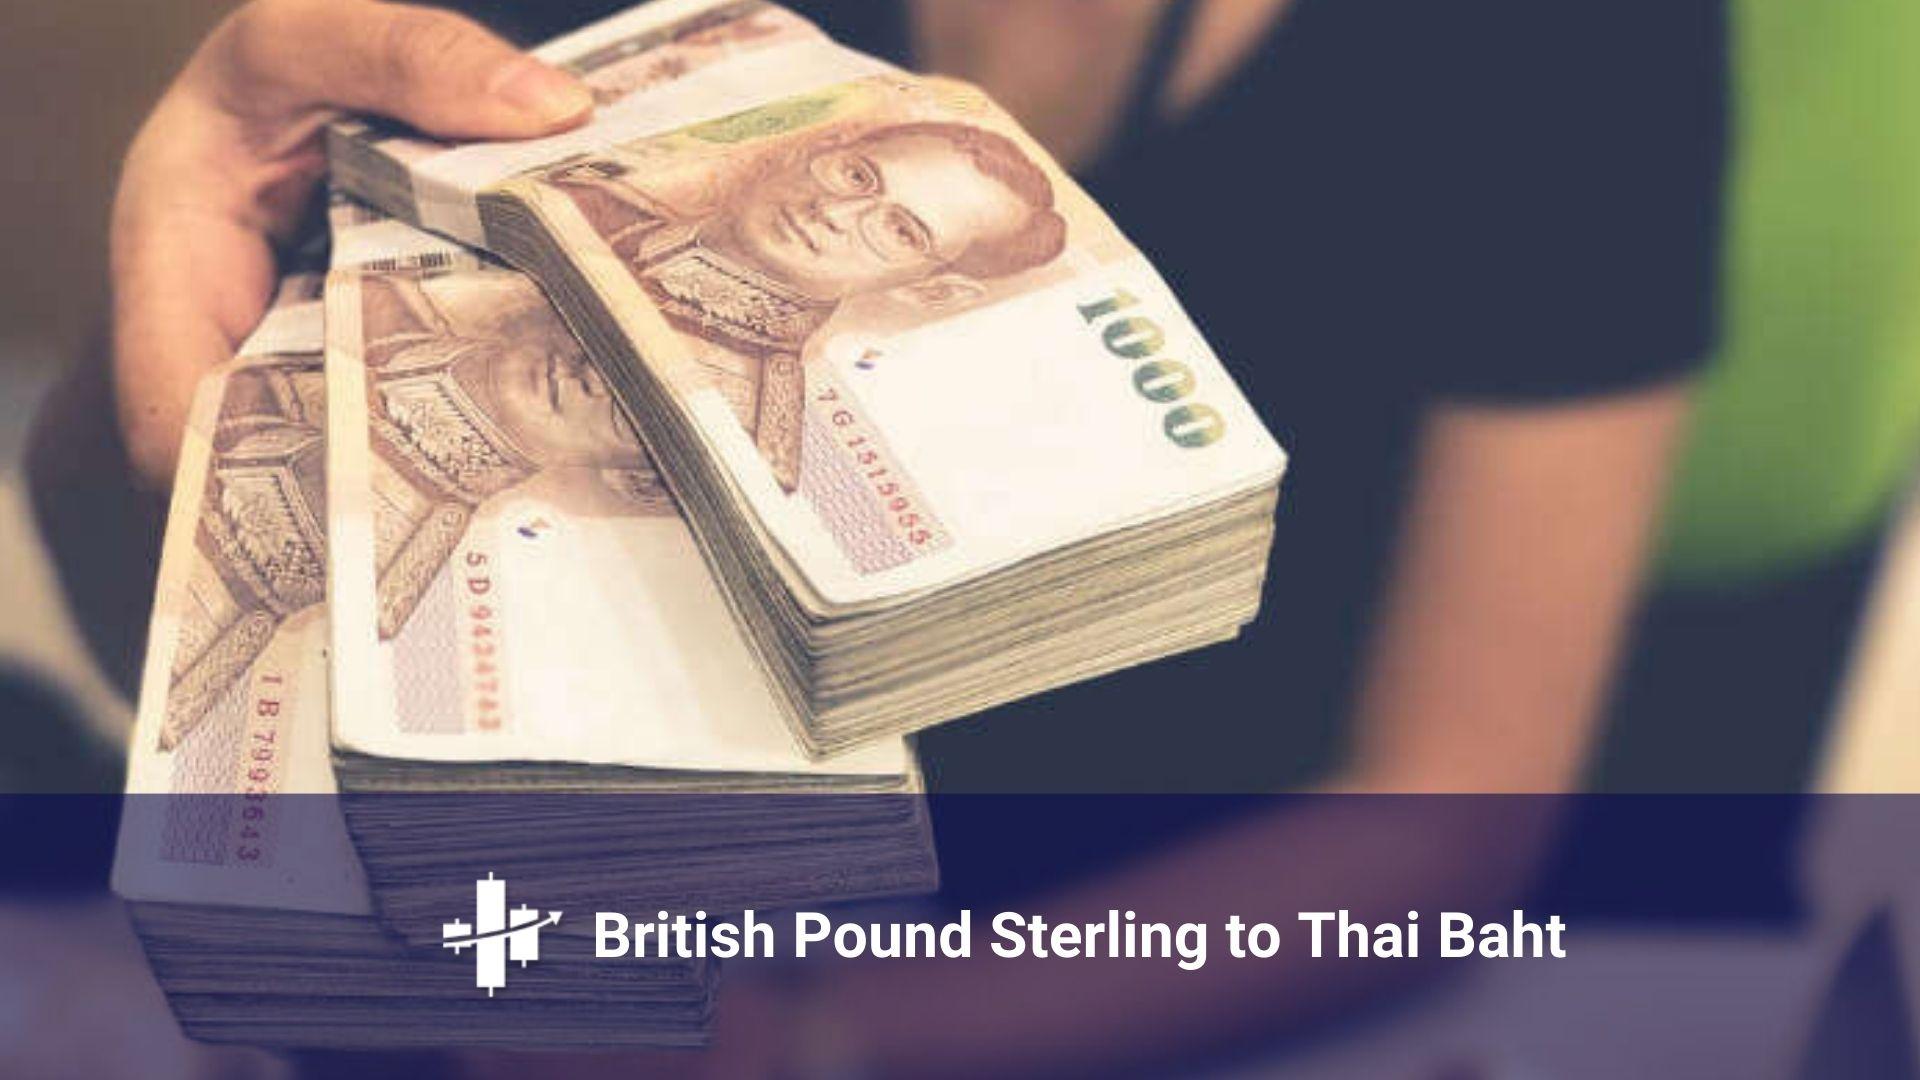 GBP to Baht